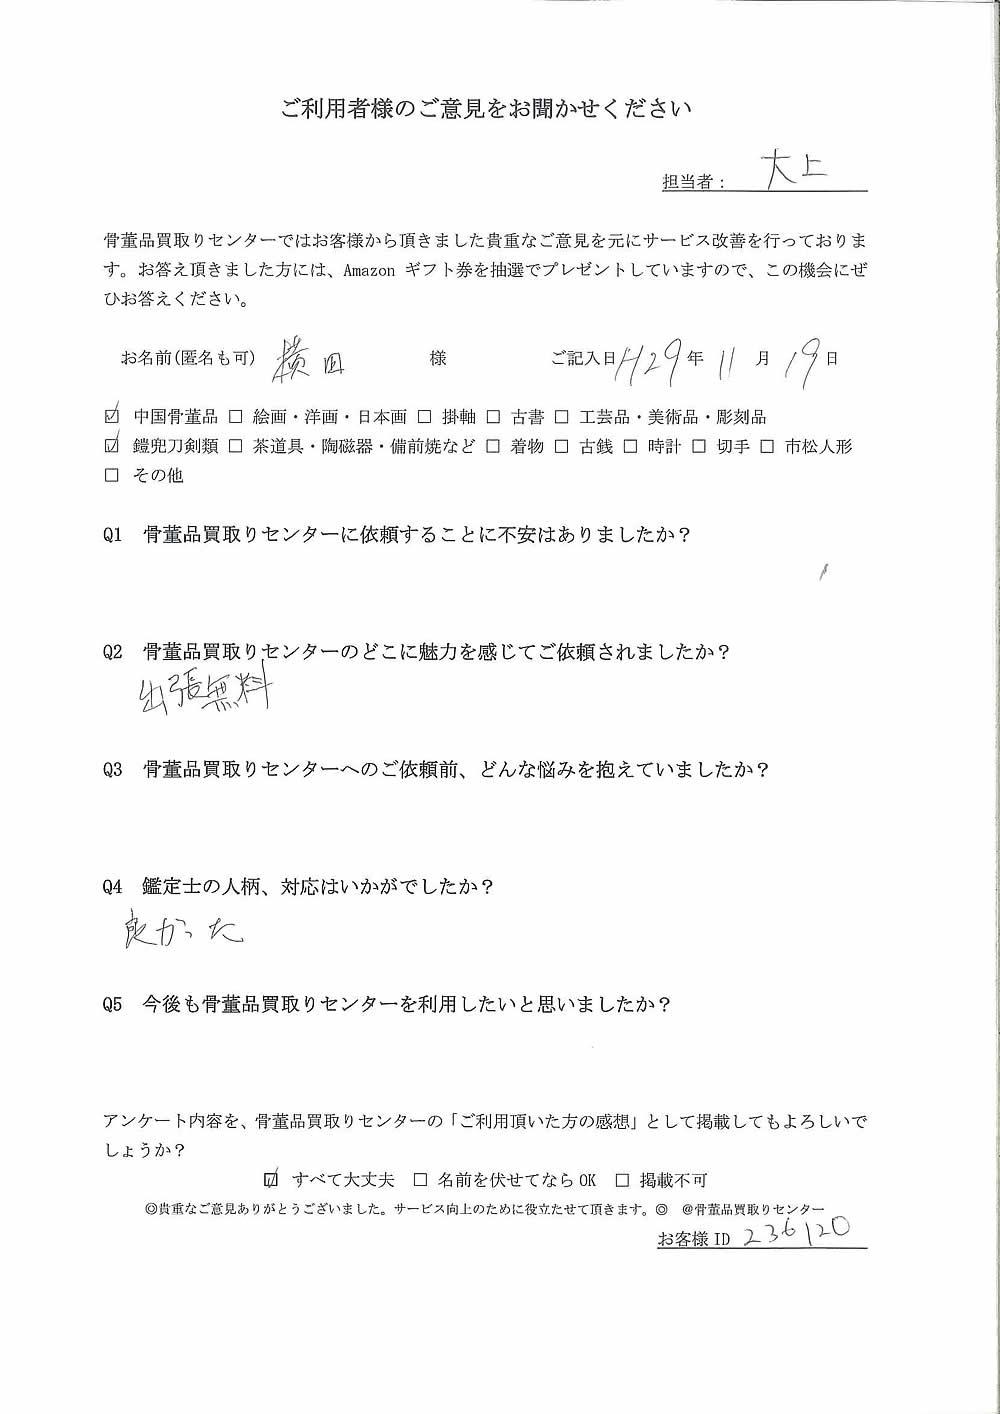 【大阪】中国骨董品、鎧兜刀剣類買取り ご利用者様の声